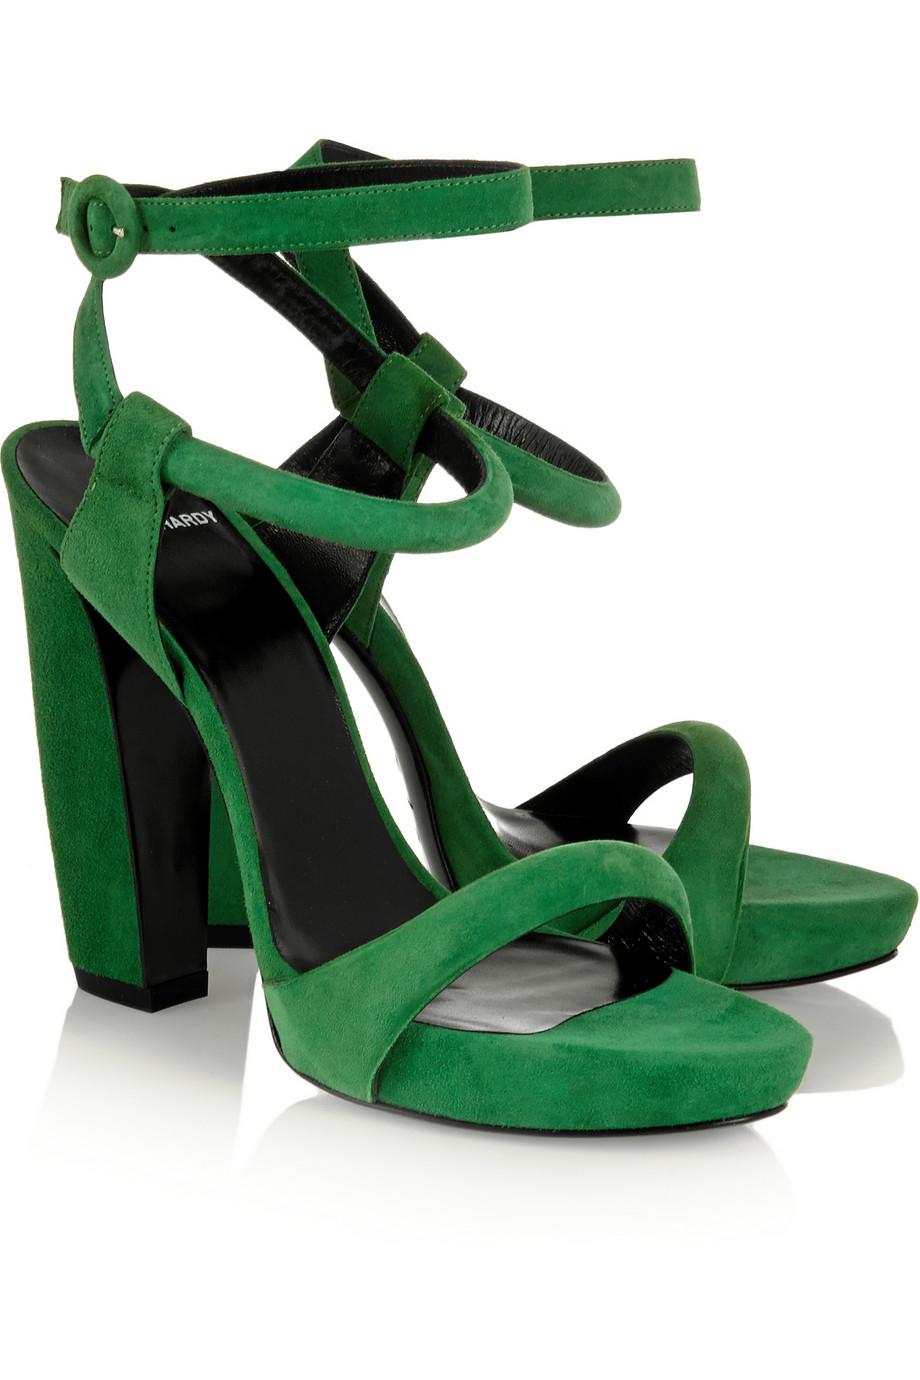 RAIDABRIELLE - High heeled sandals - orange YthQl